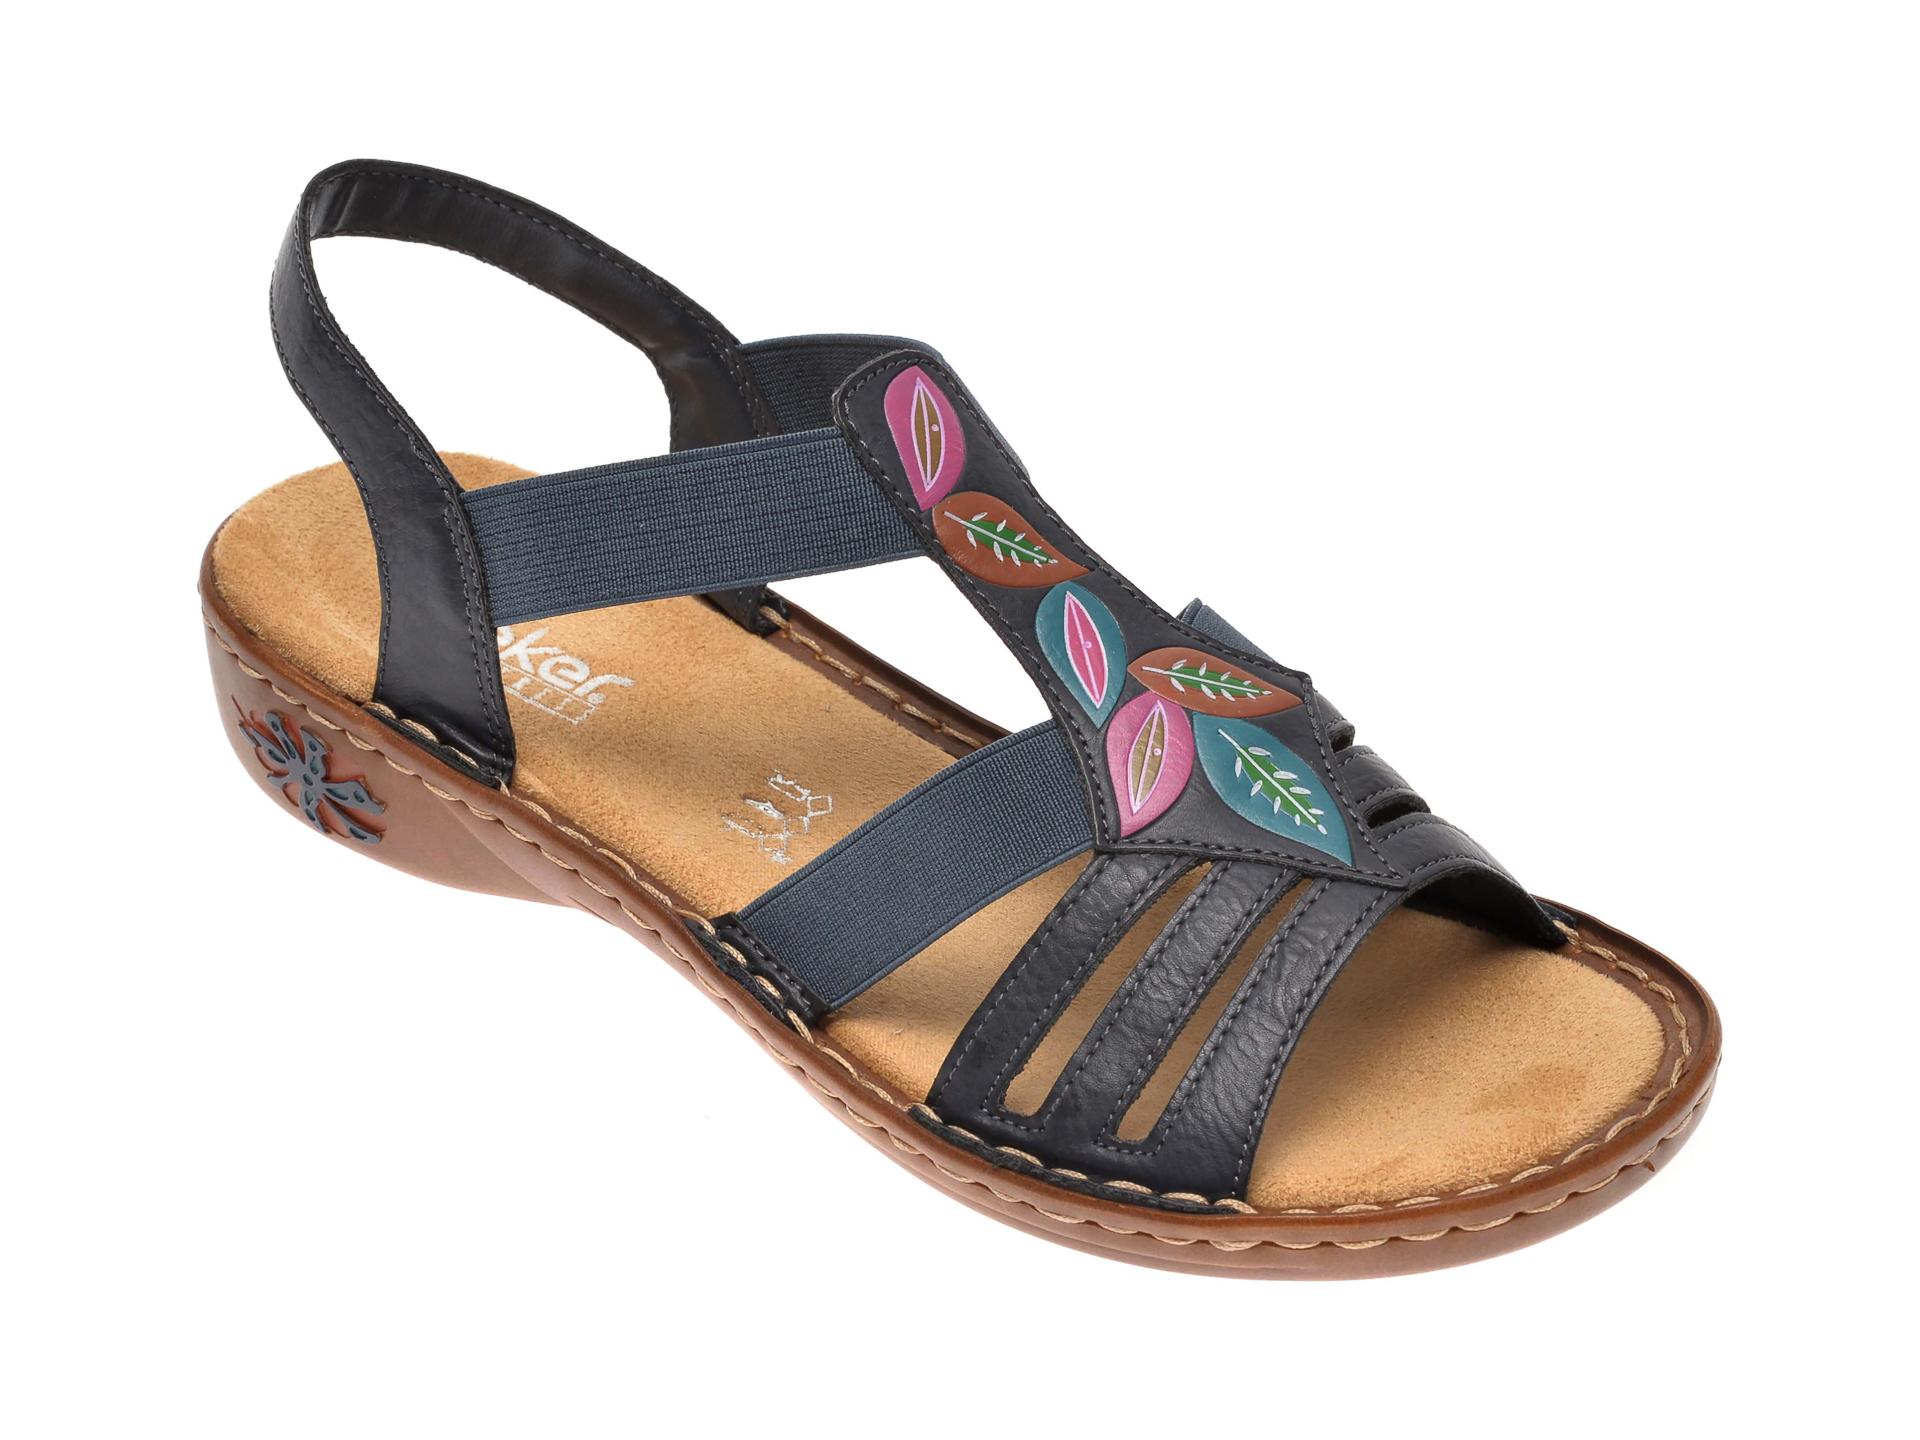 Sandale RIEKER bleumarin, 60171, din piele ecologica